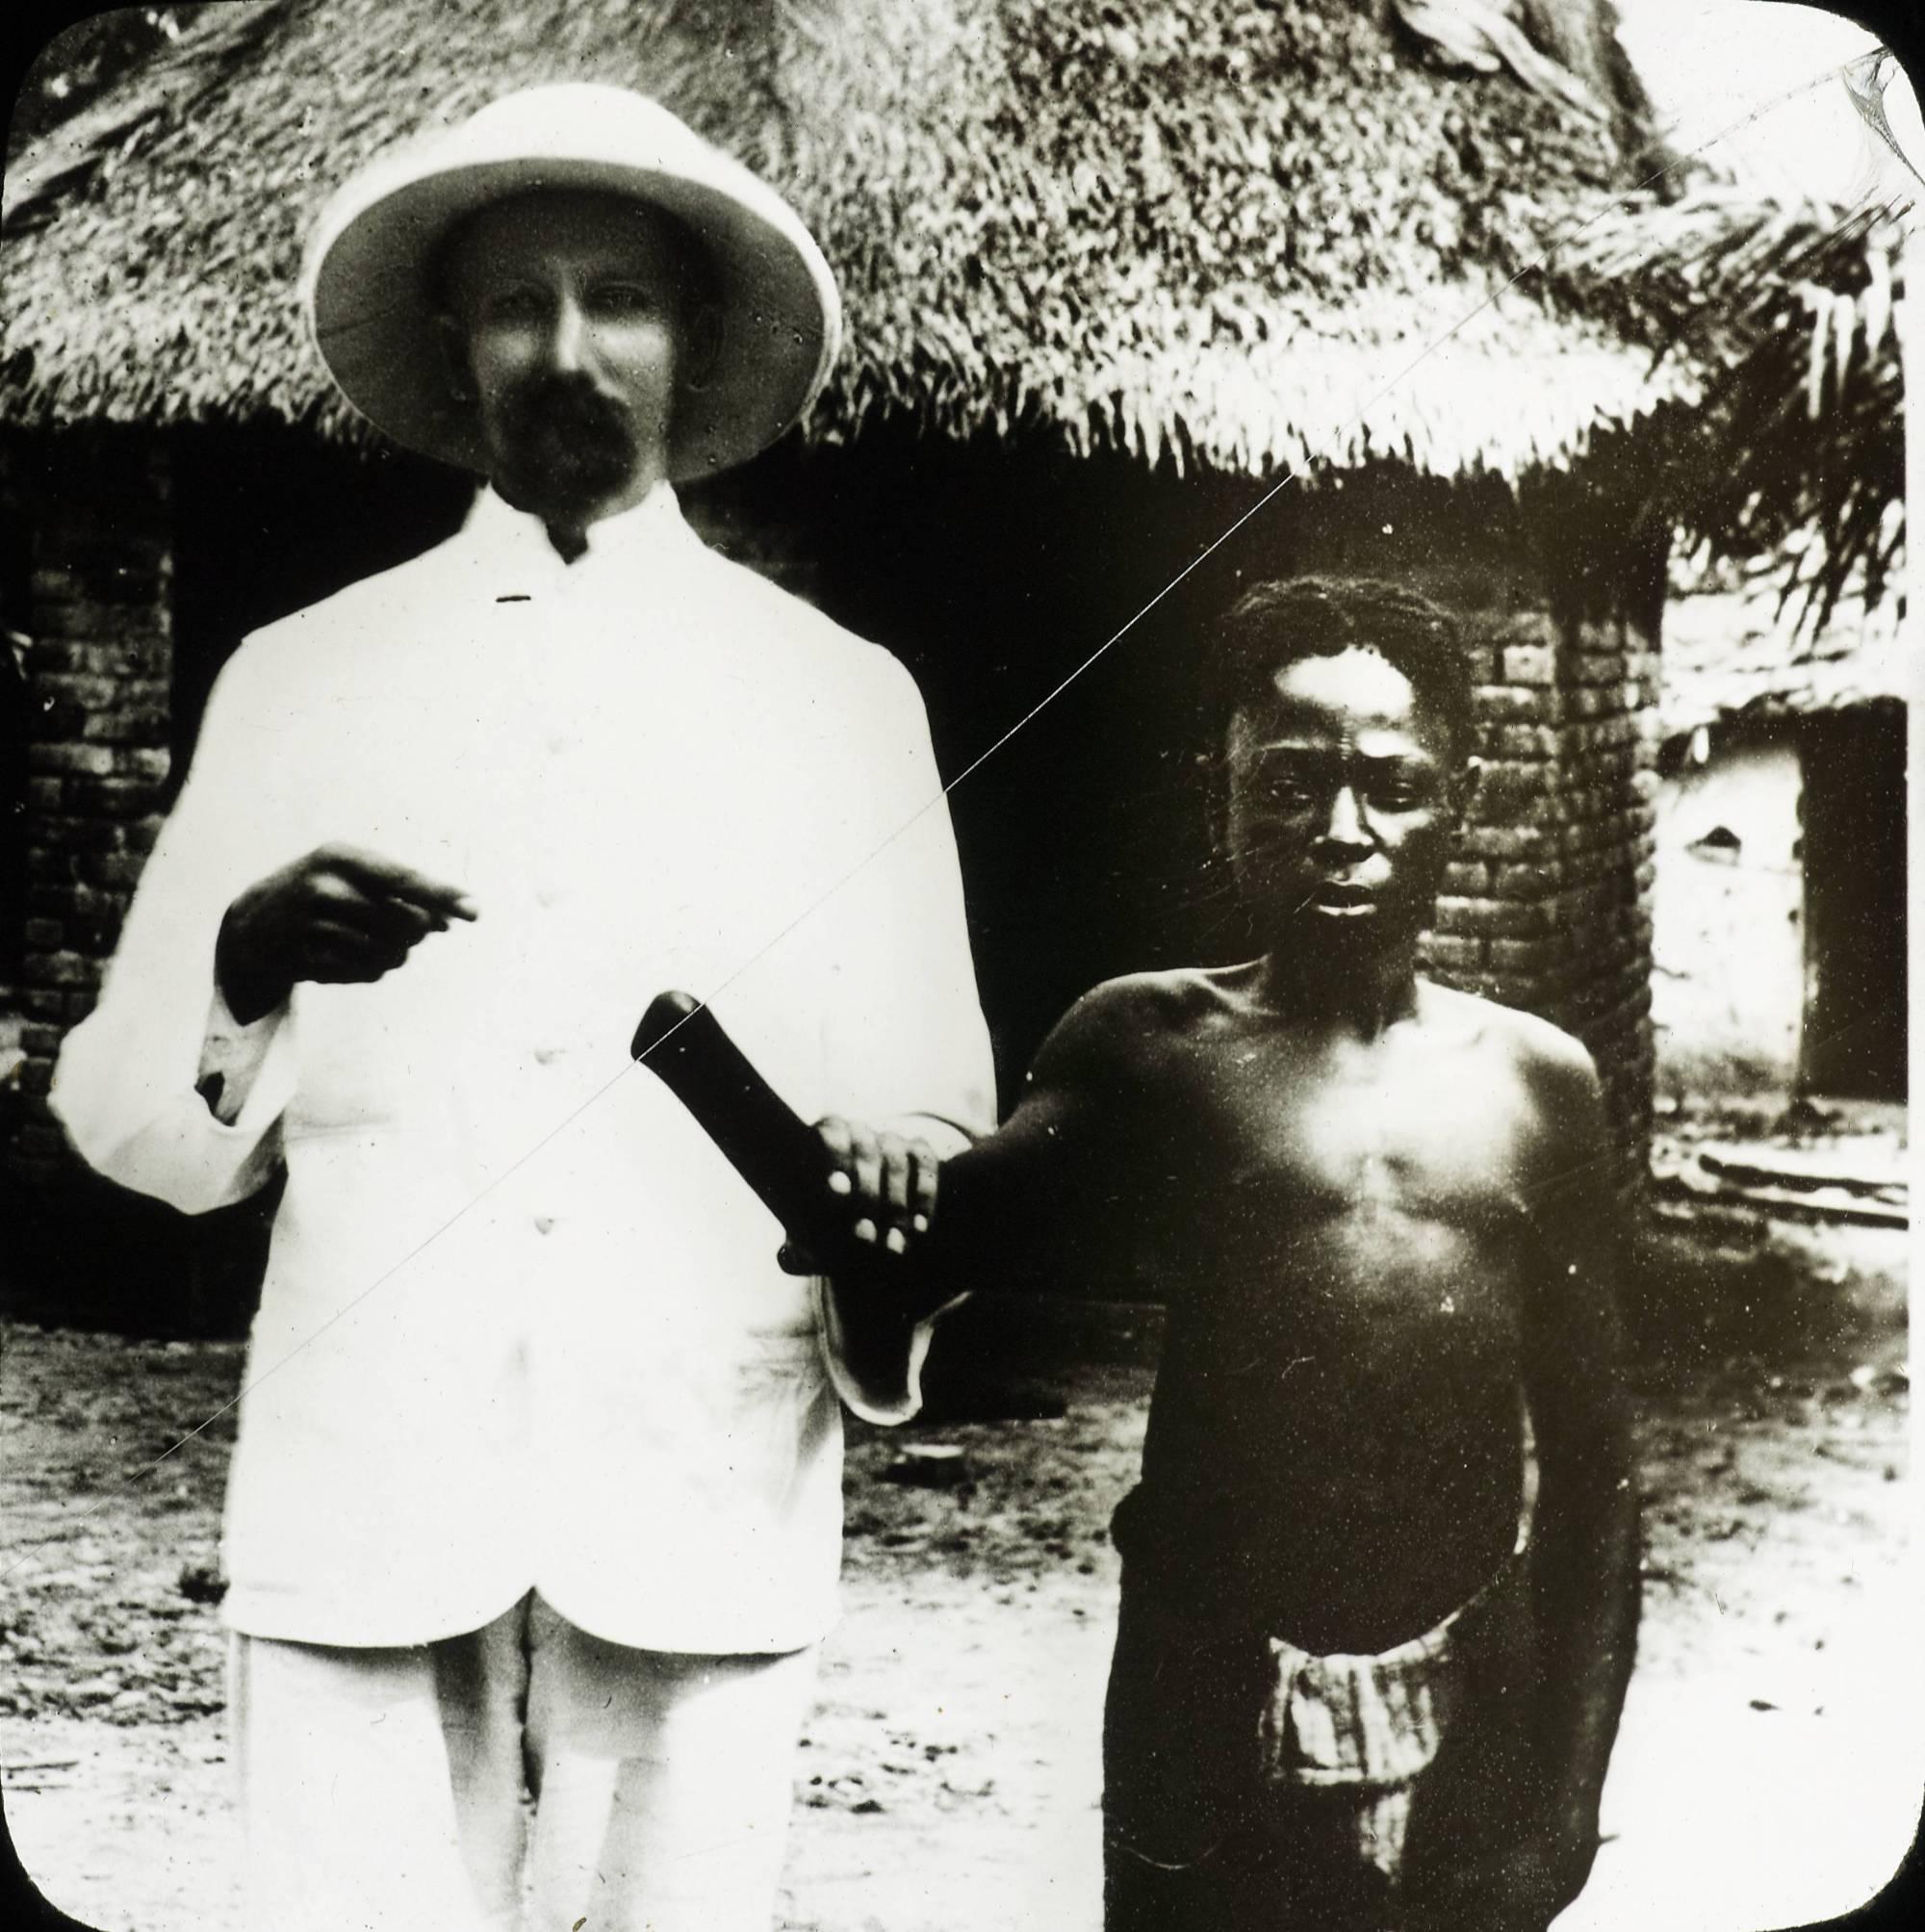 victim_of_congo_atrocities_congo_ca-_1890-1910_imp-cscnww33-os10-19